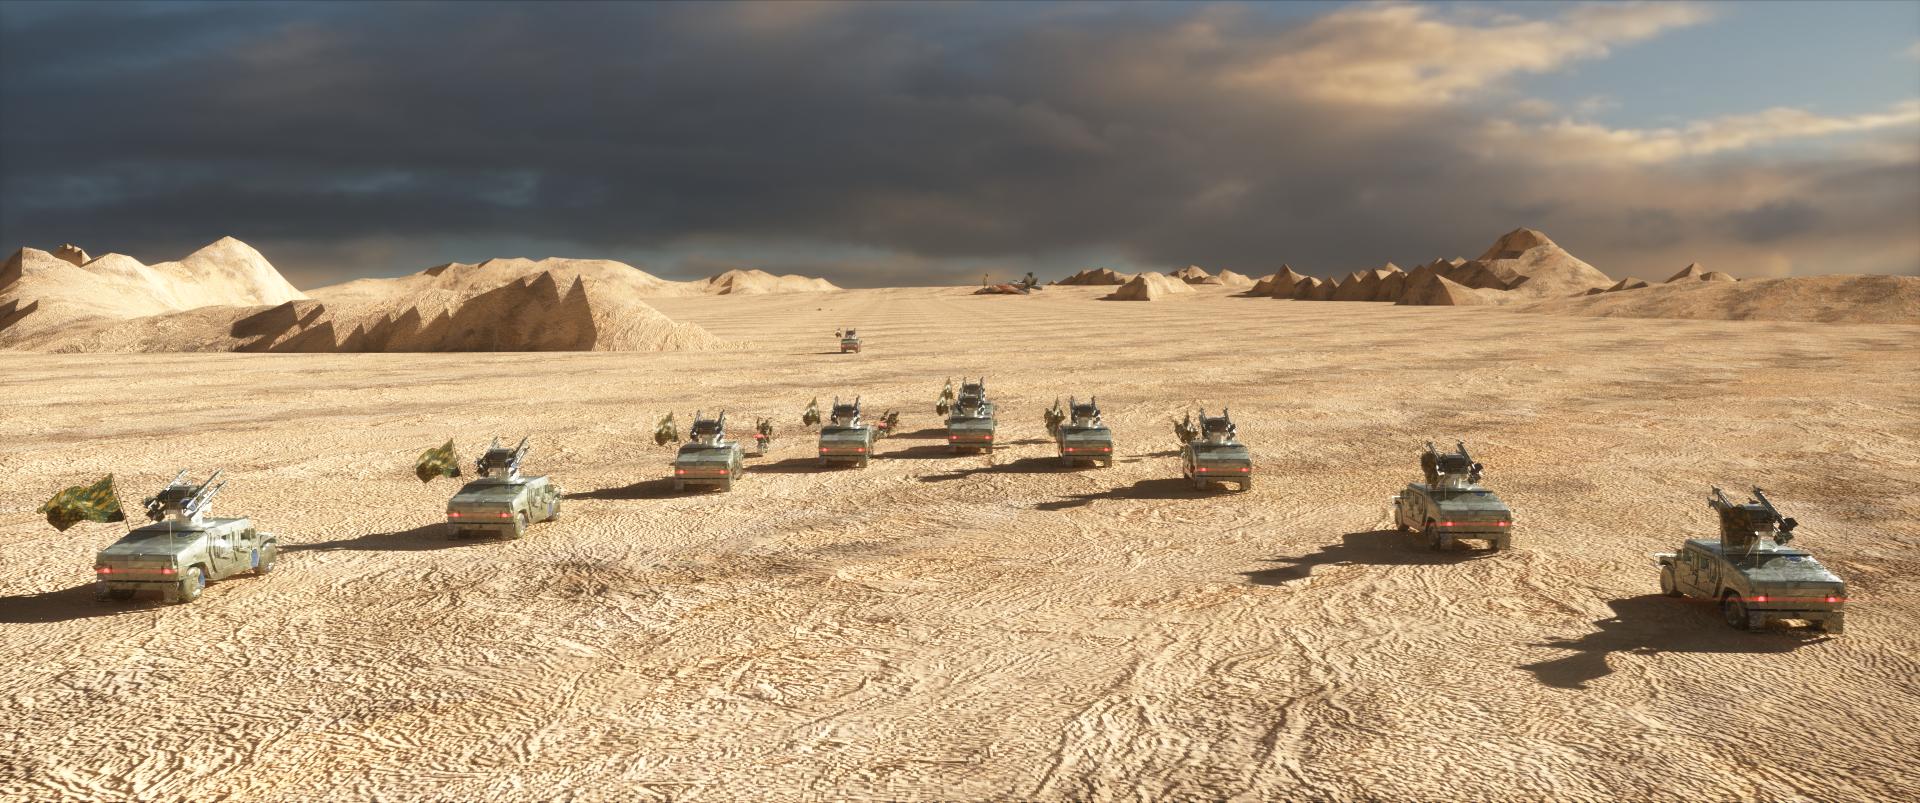 Desert_hammers_07.png